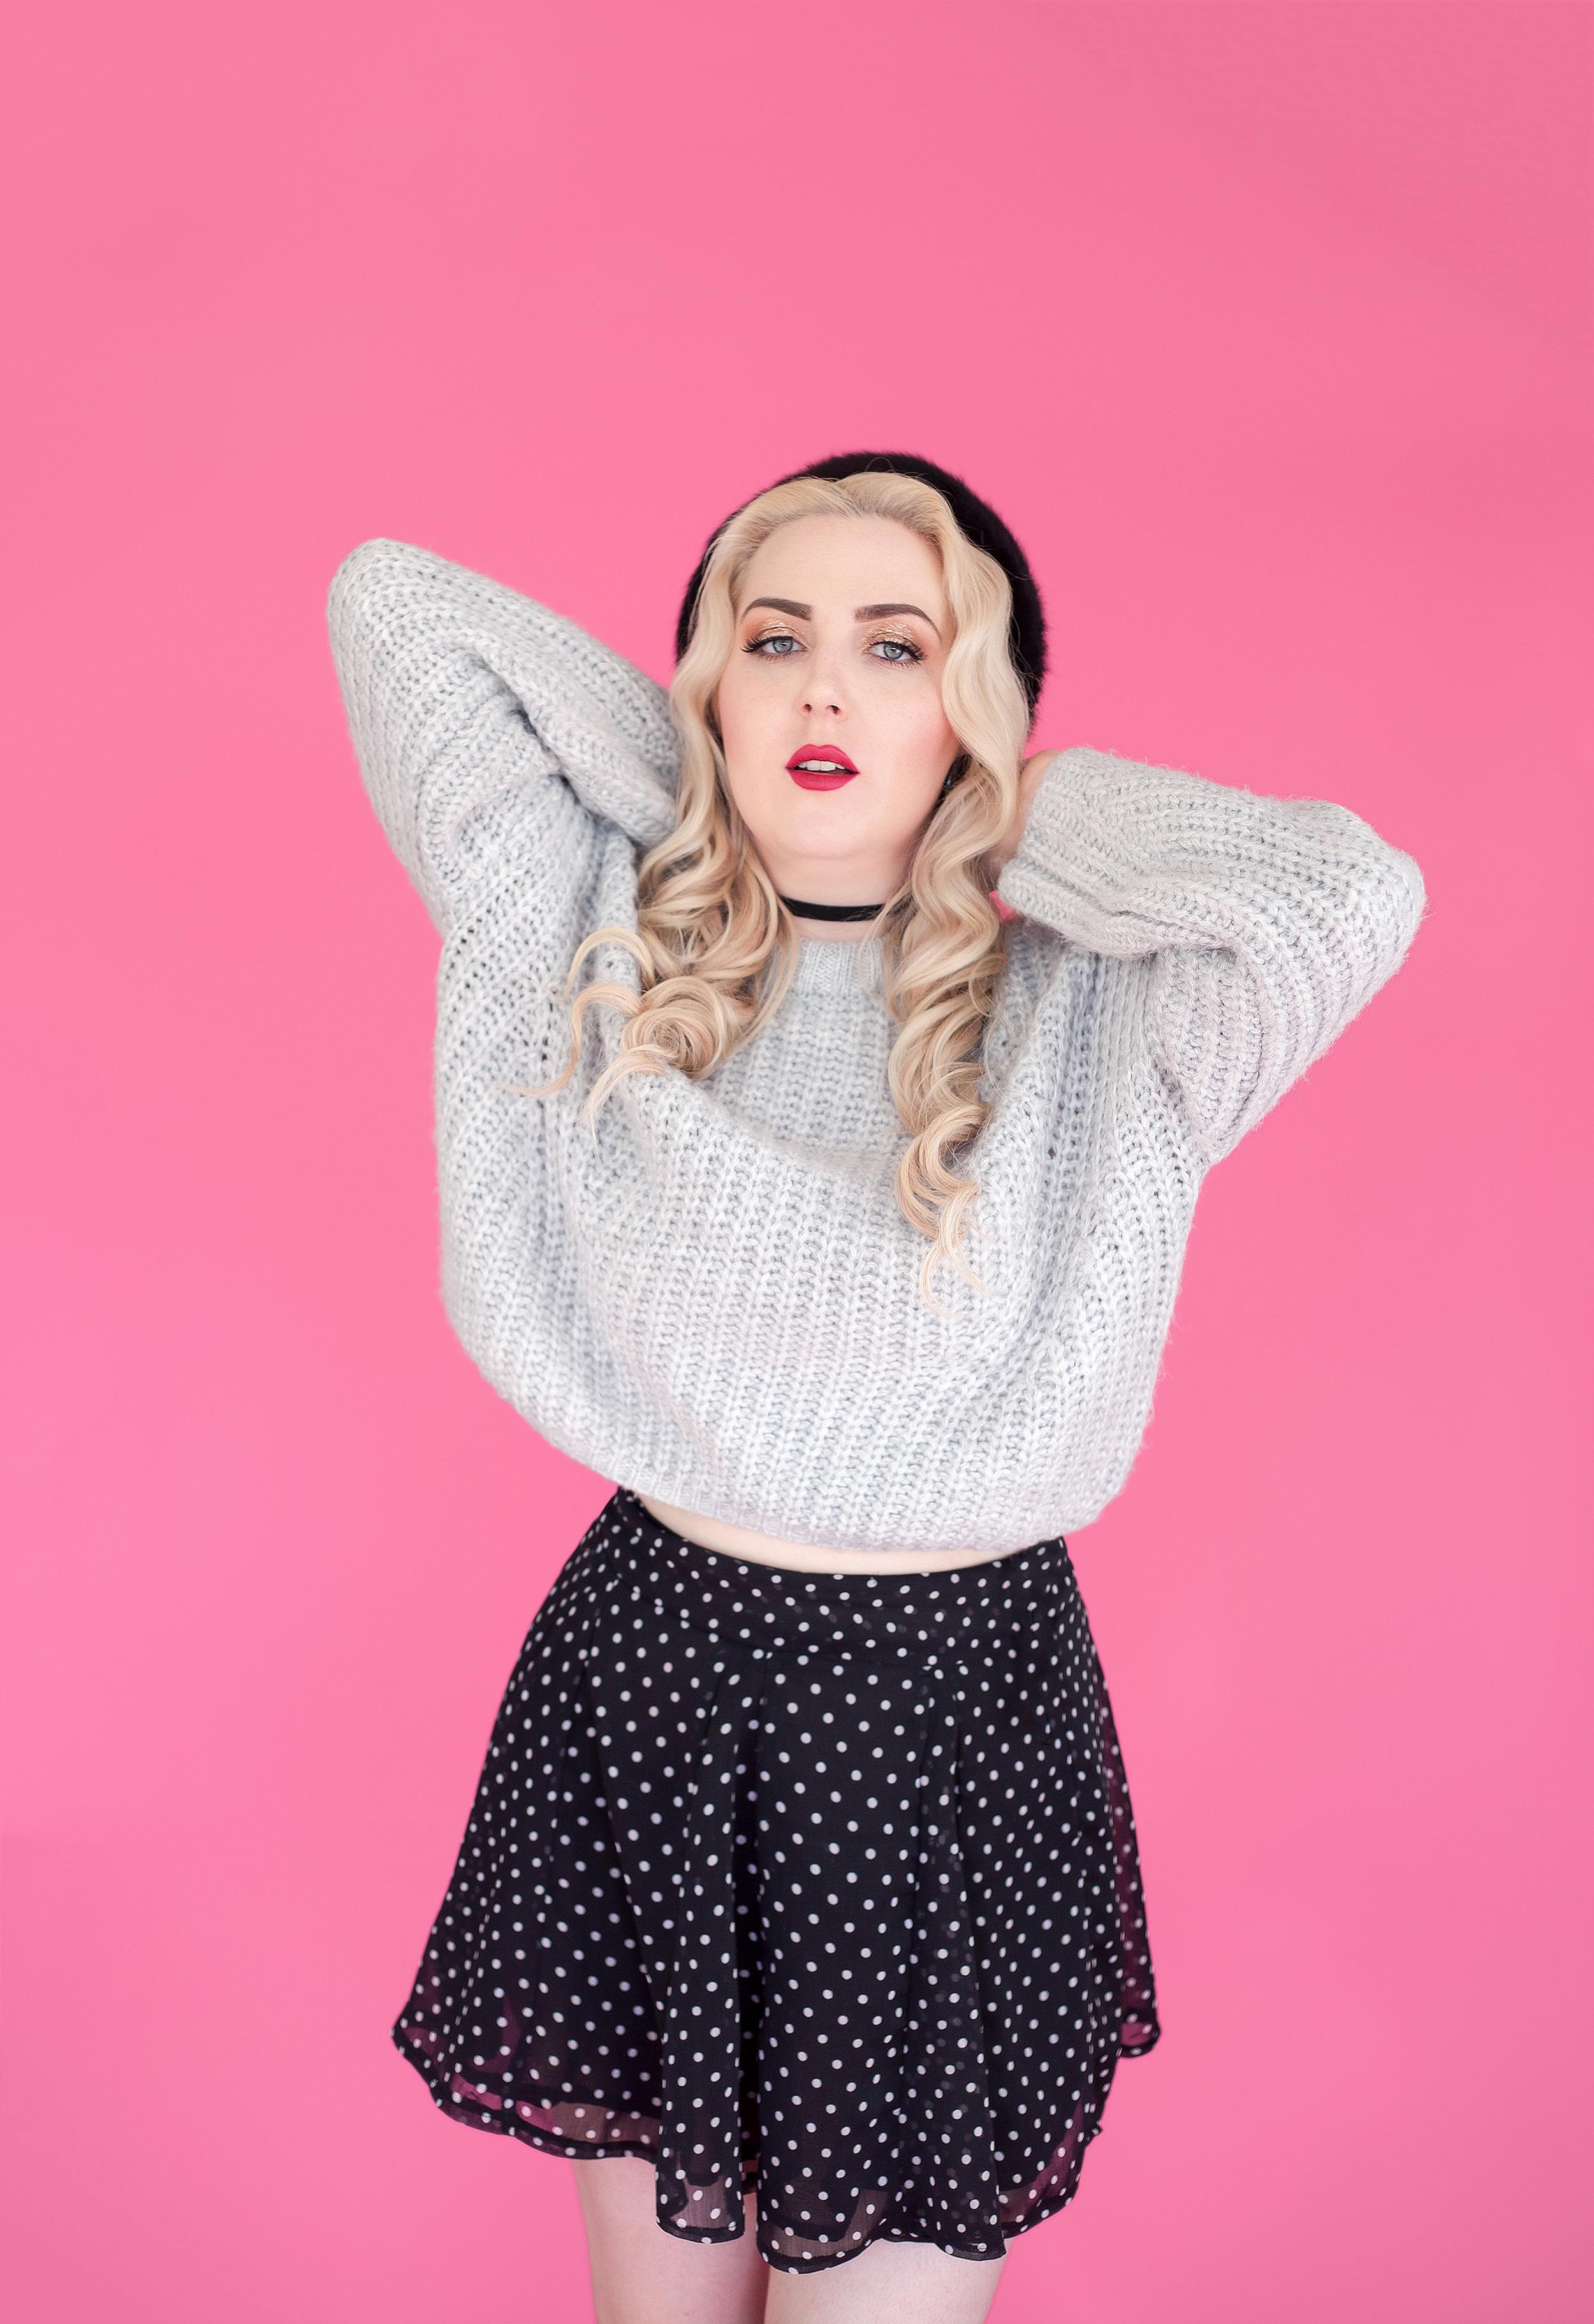 Creative-Integrity-Polka-Skirt